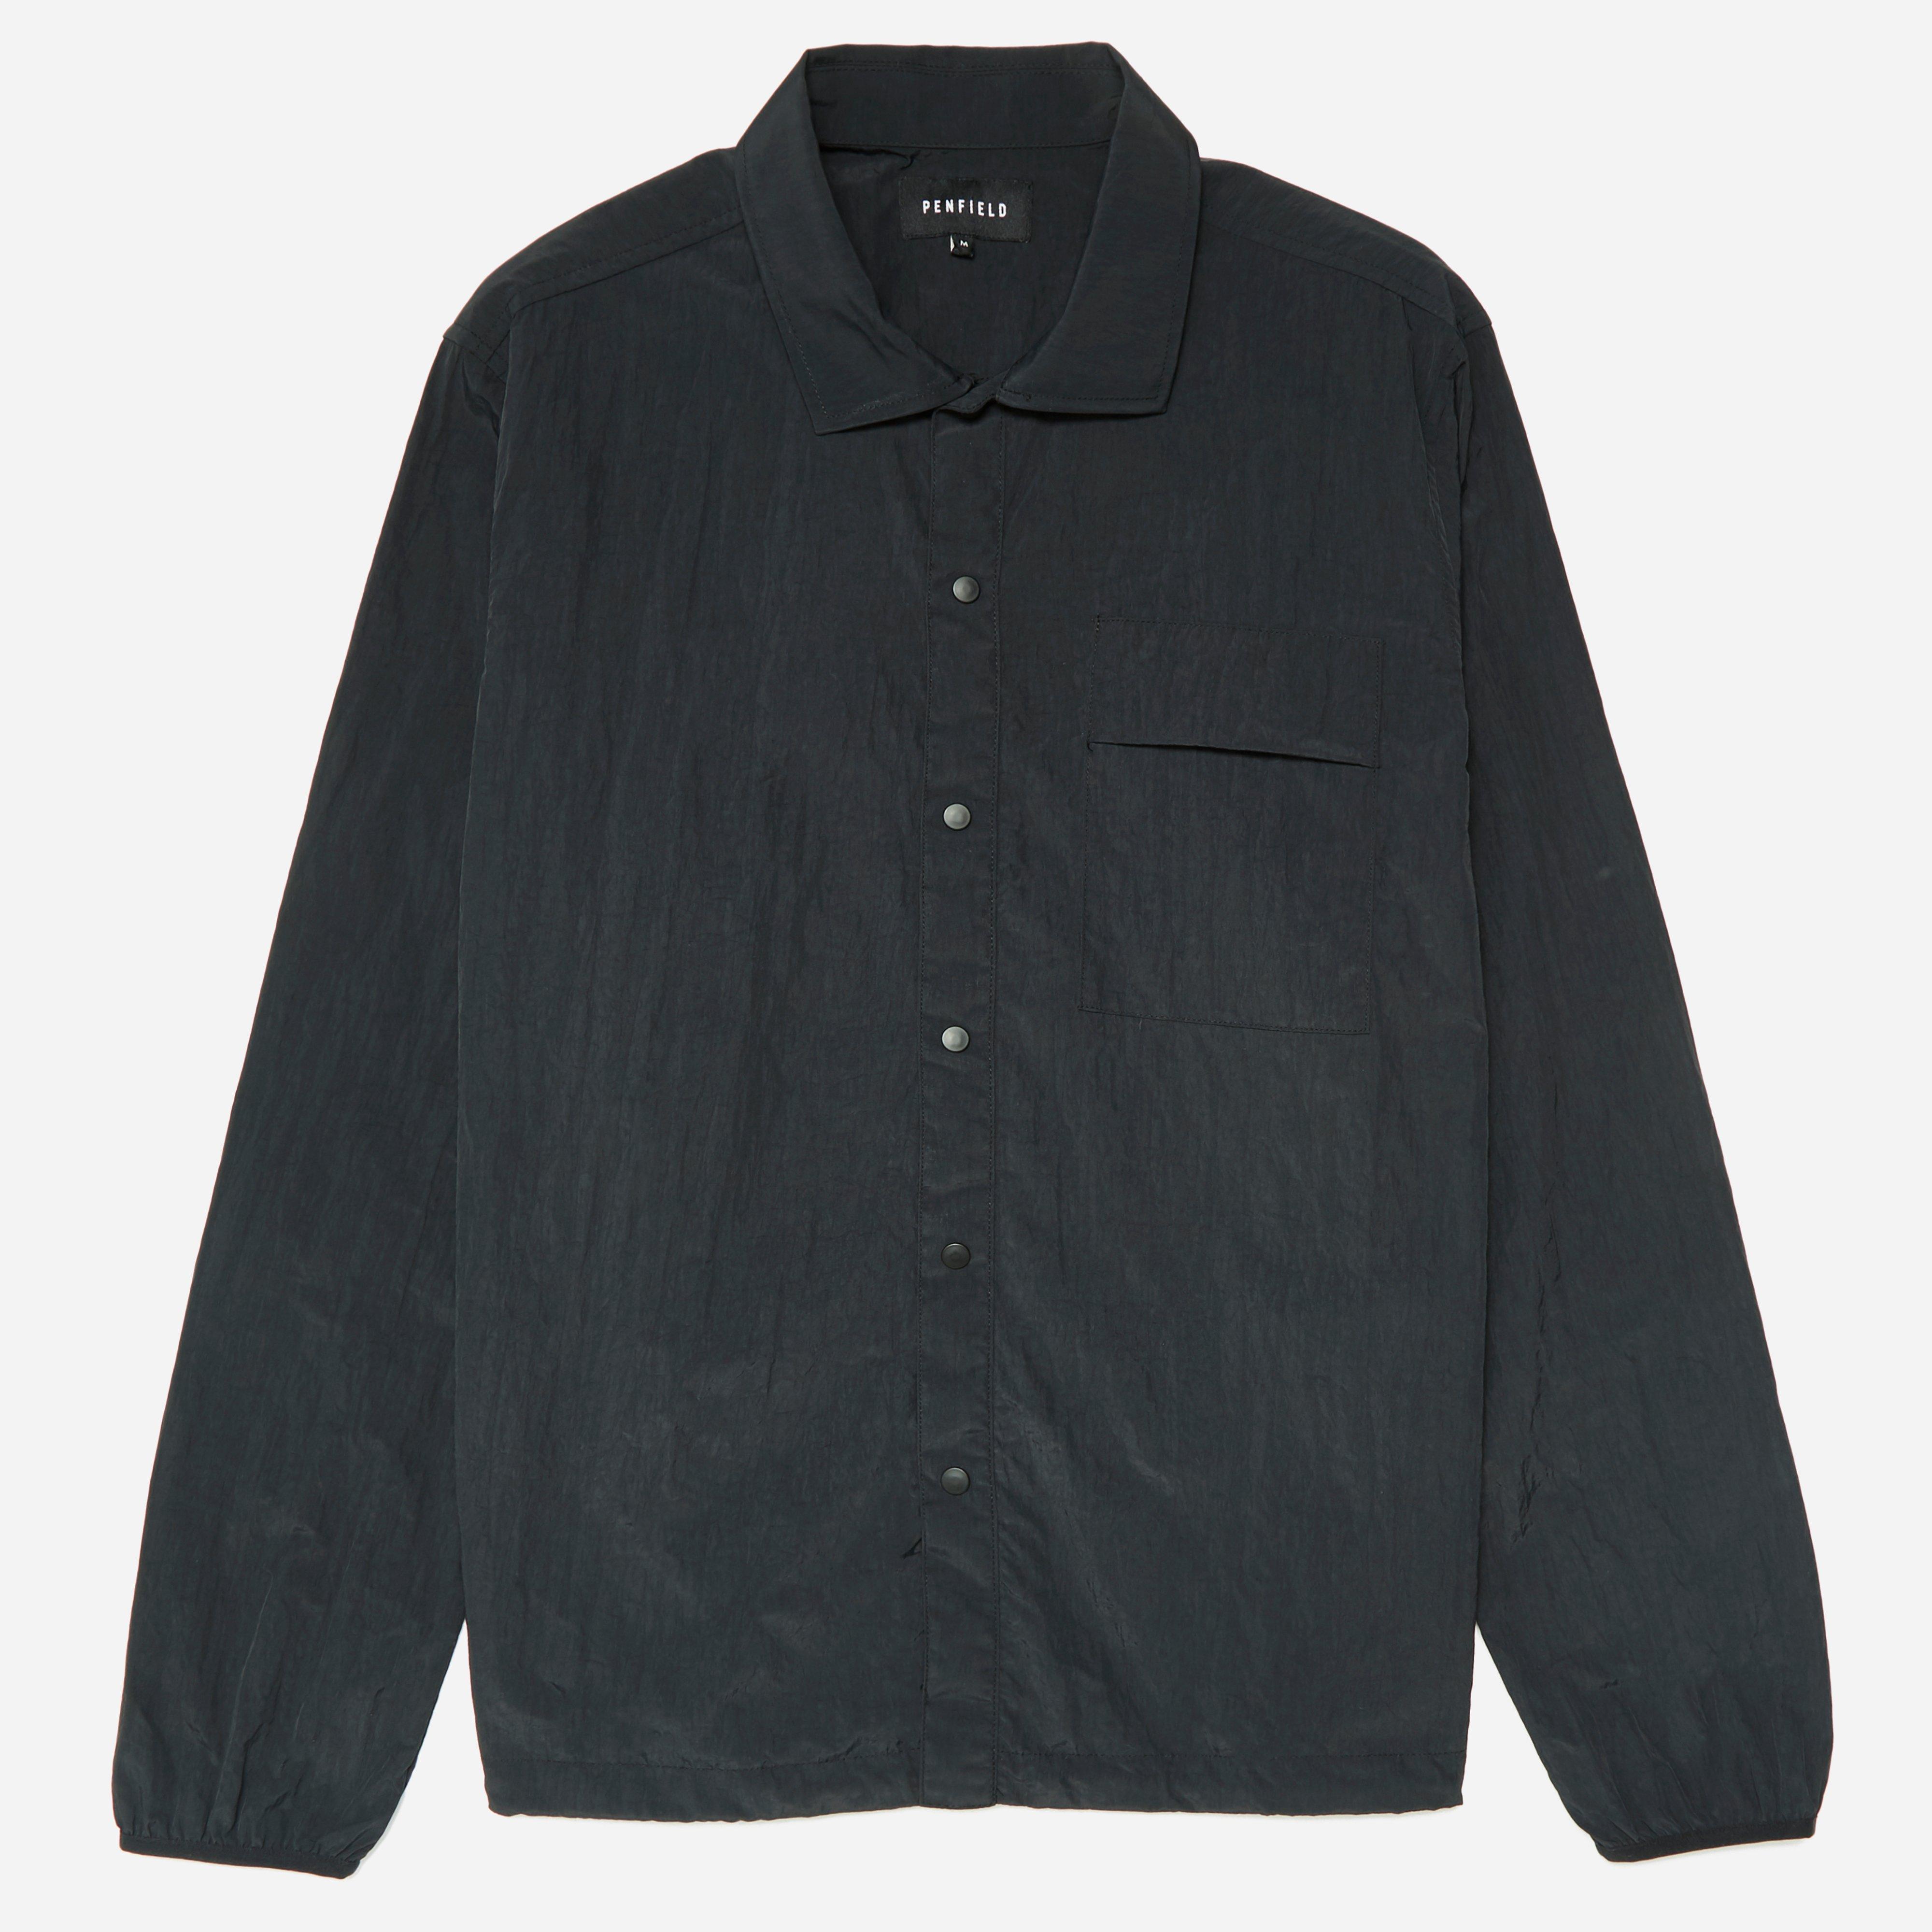 Penfield Blackstone Tech Shirt